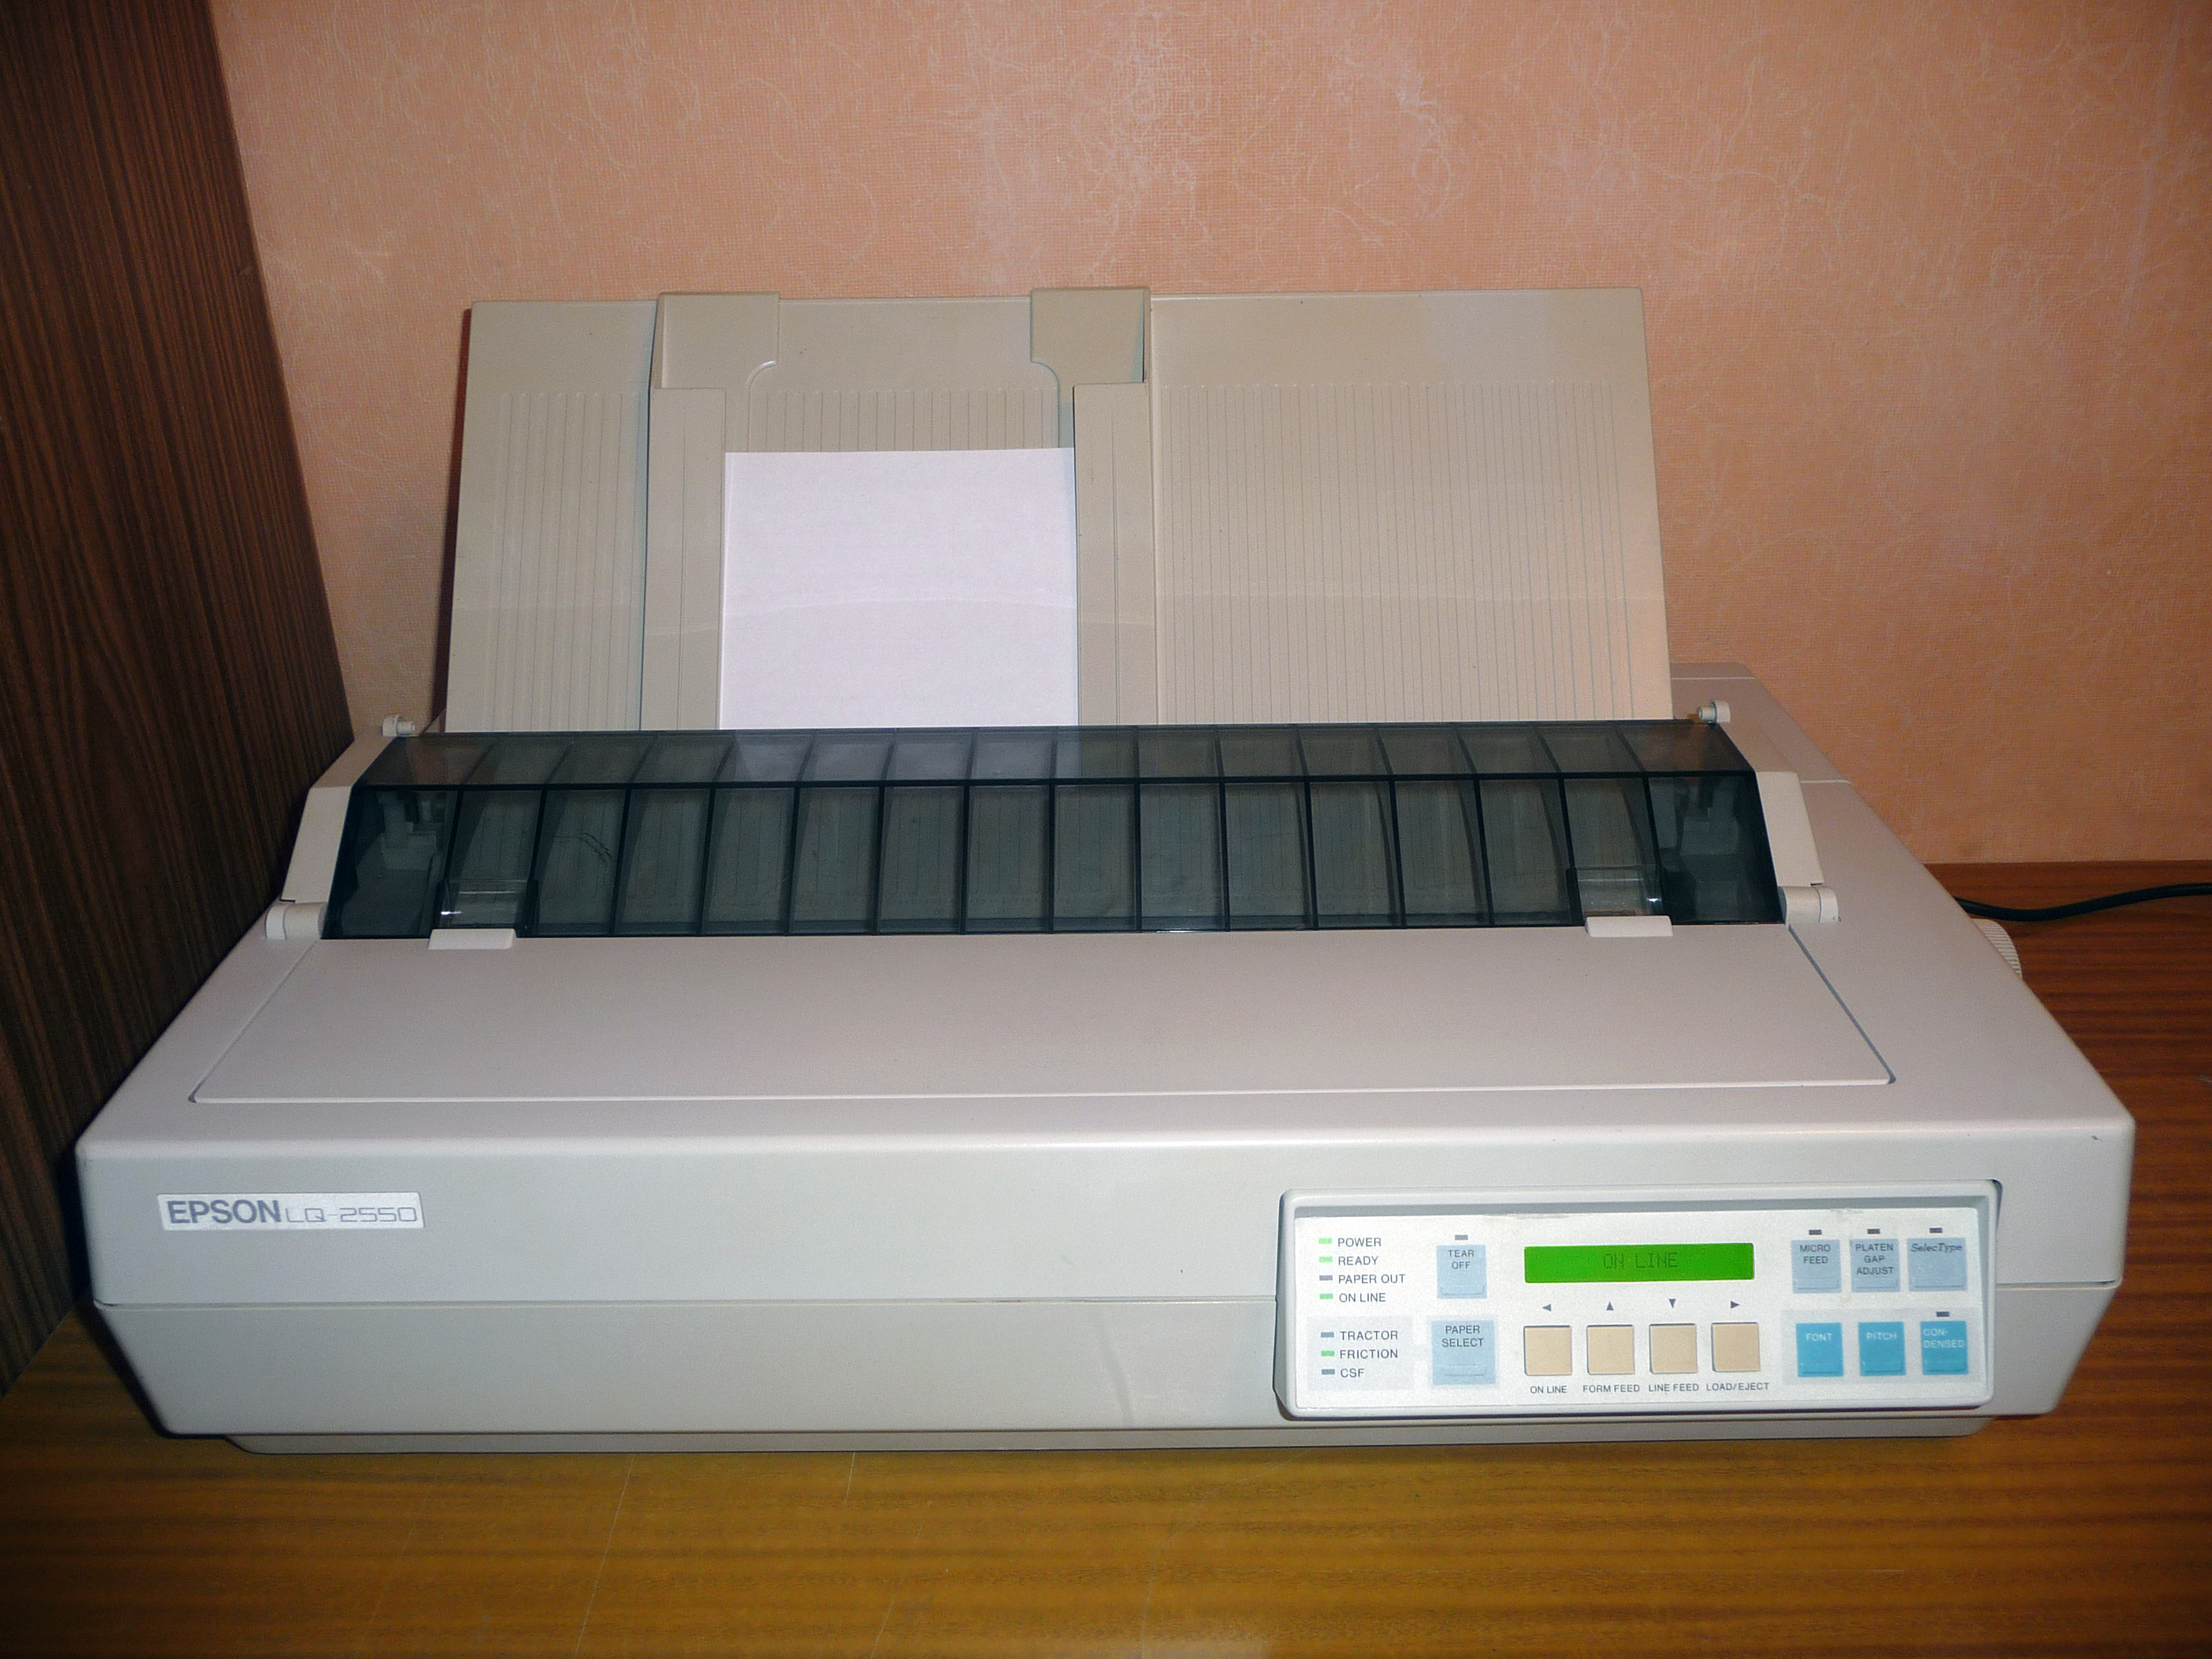 File:Матричный принтер Epson LQ-2550.jpg